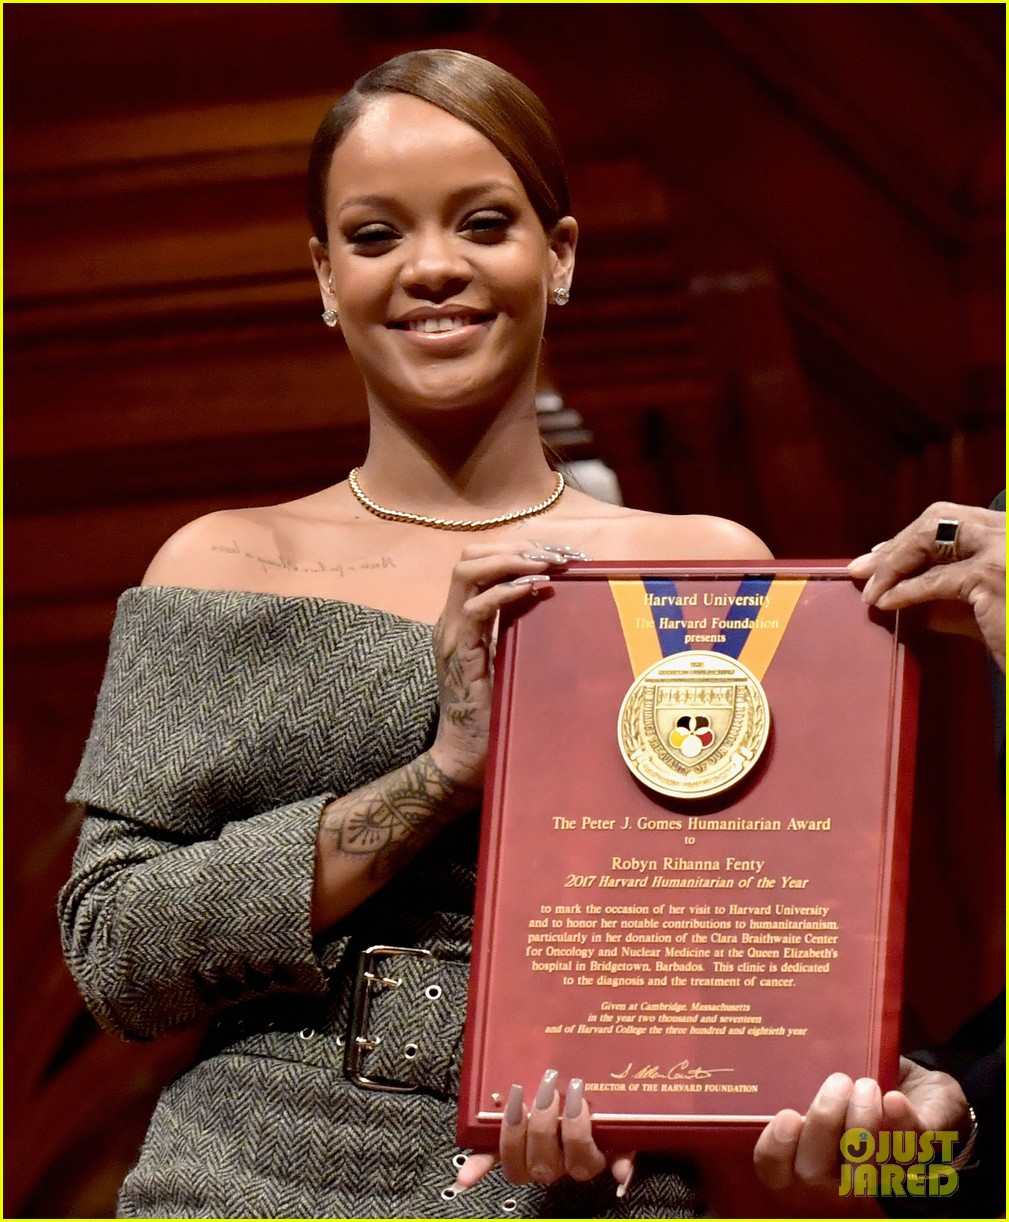 humanitarian award speech